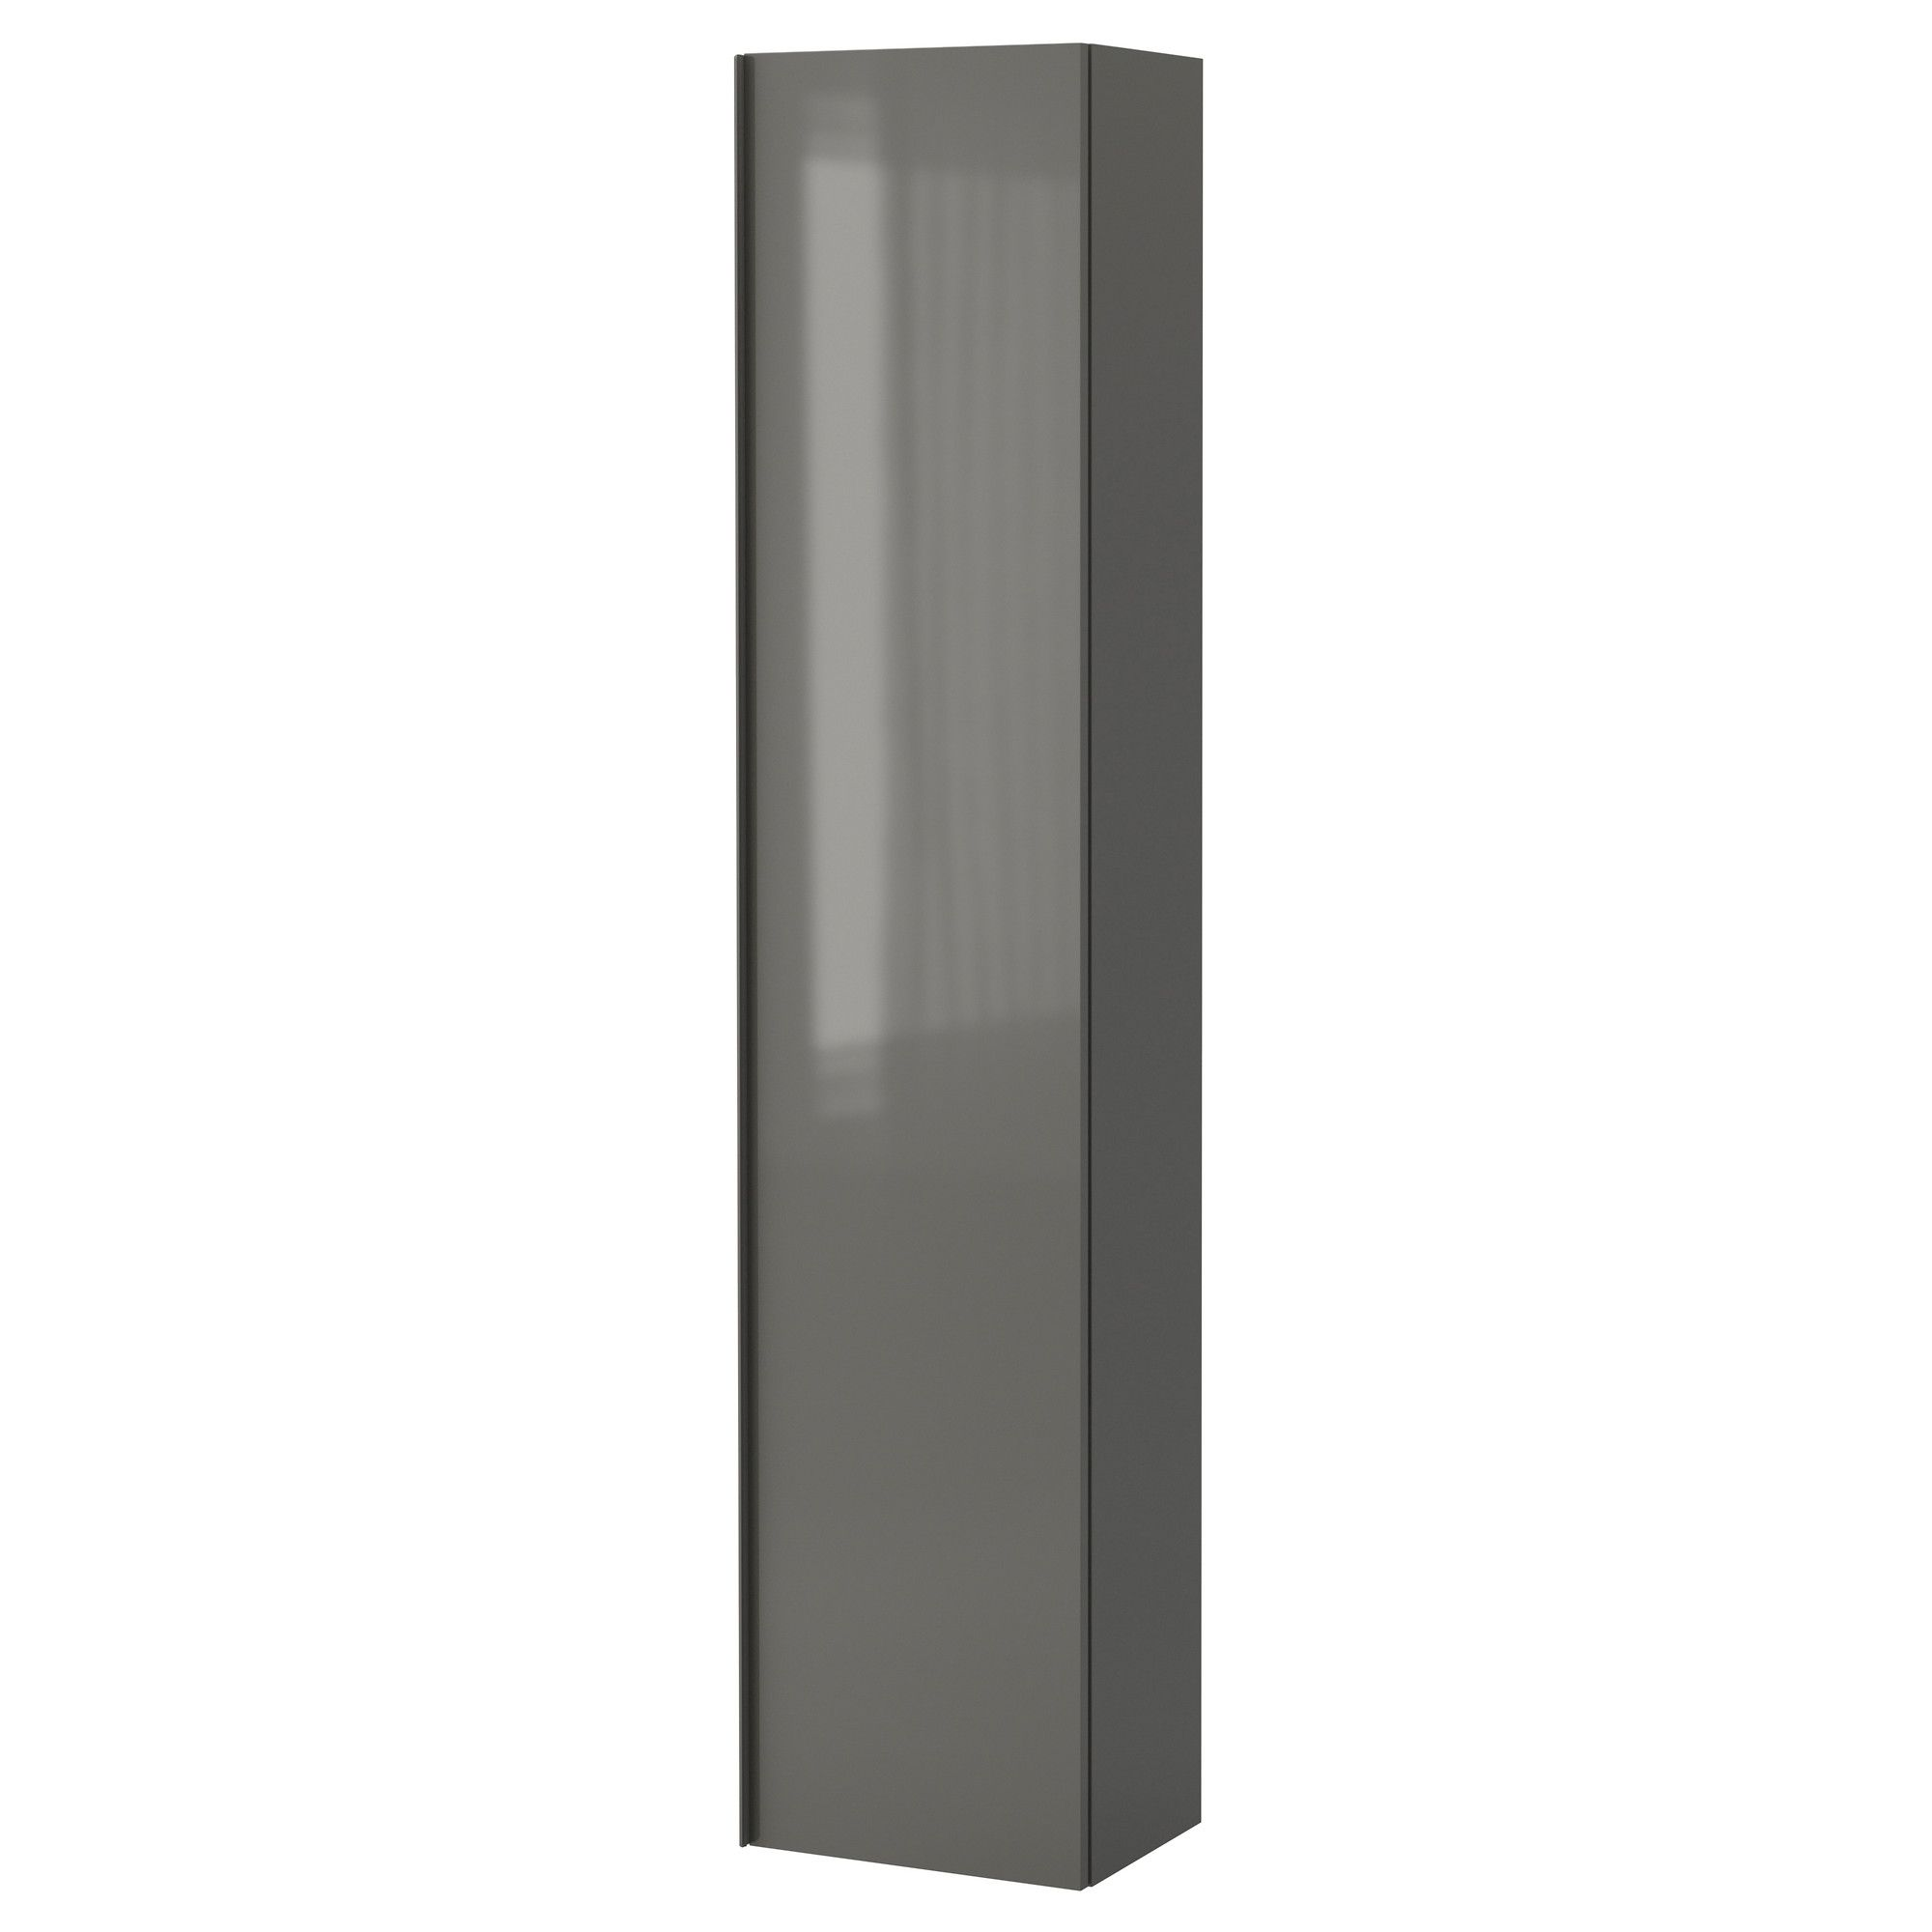 BOYS BATHROOM: IKEA GODMORGON High cabinet - high gloss gray. We ...